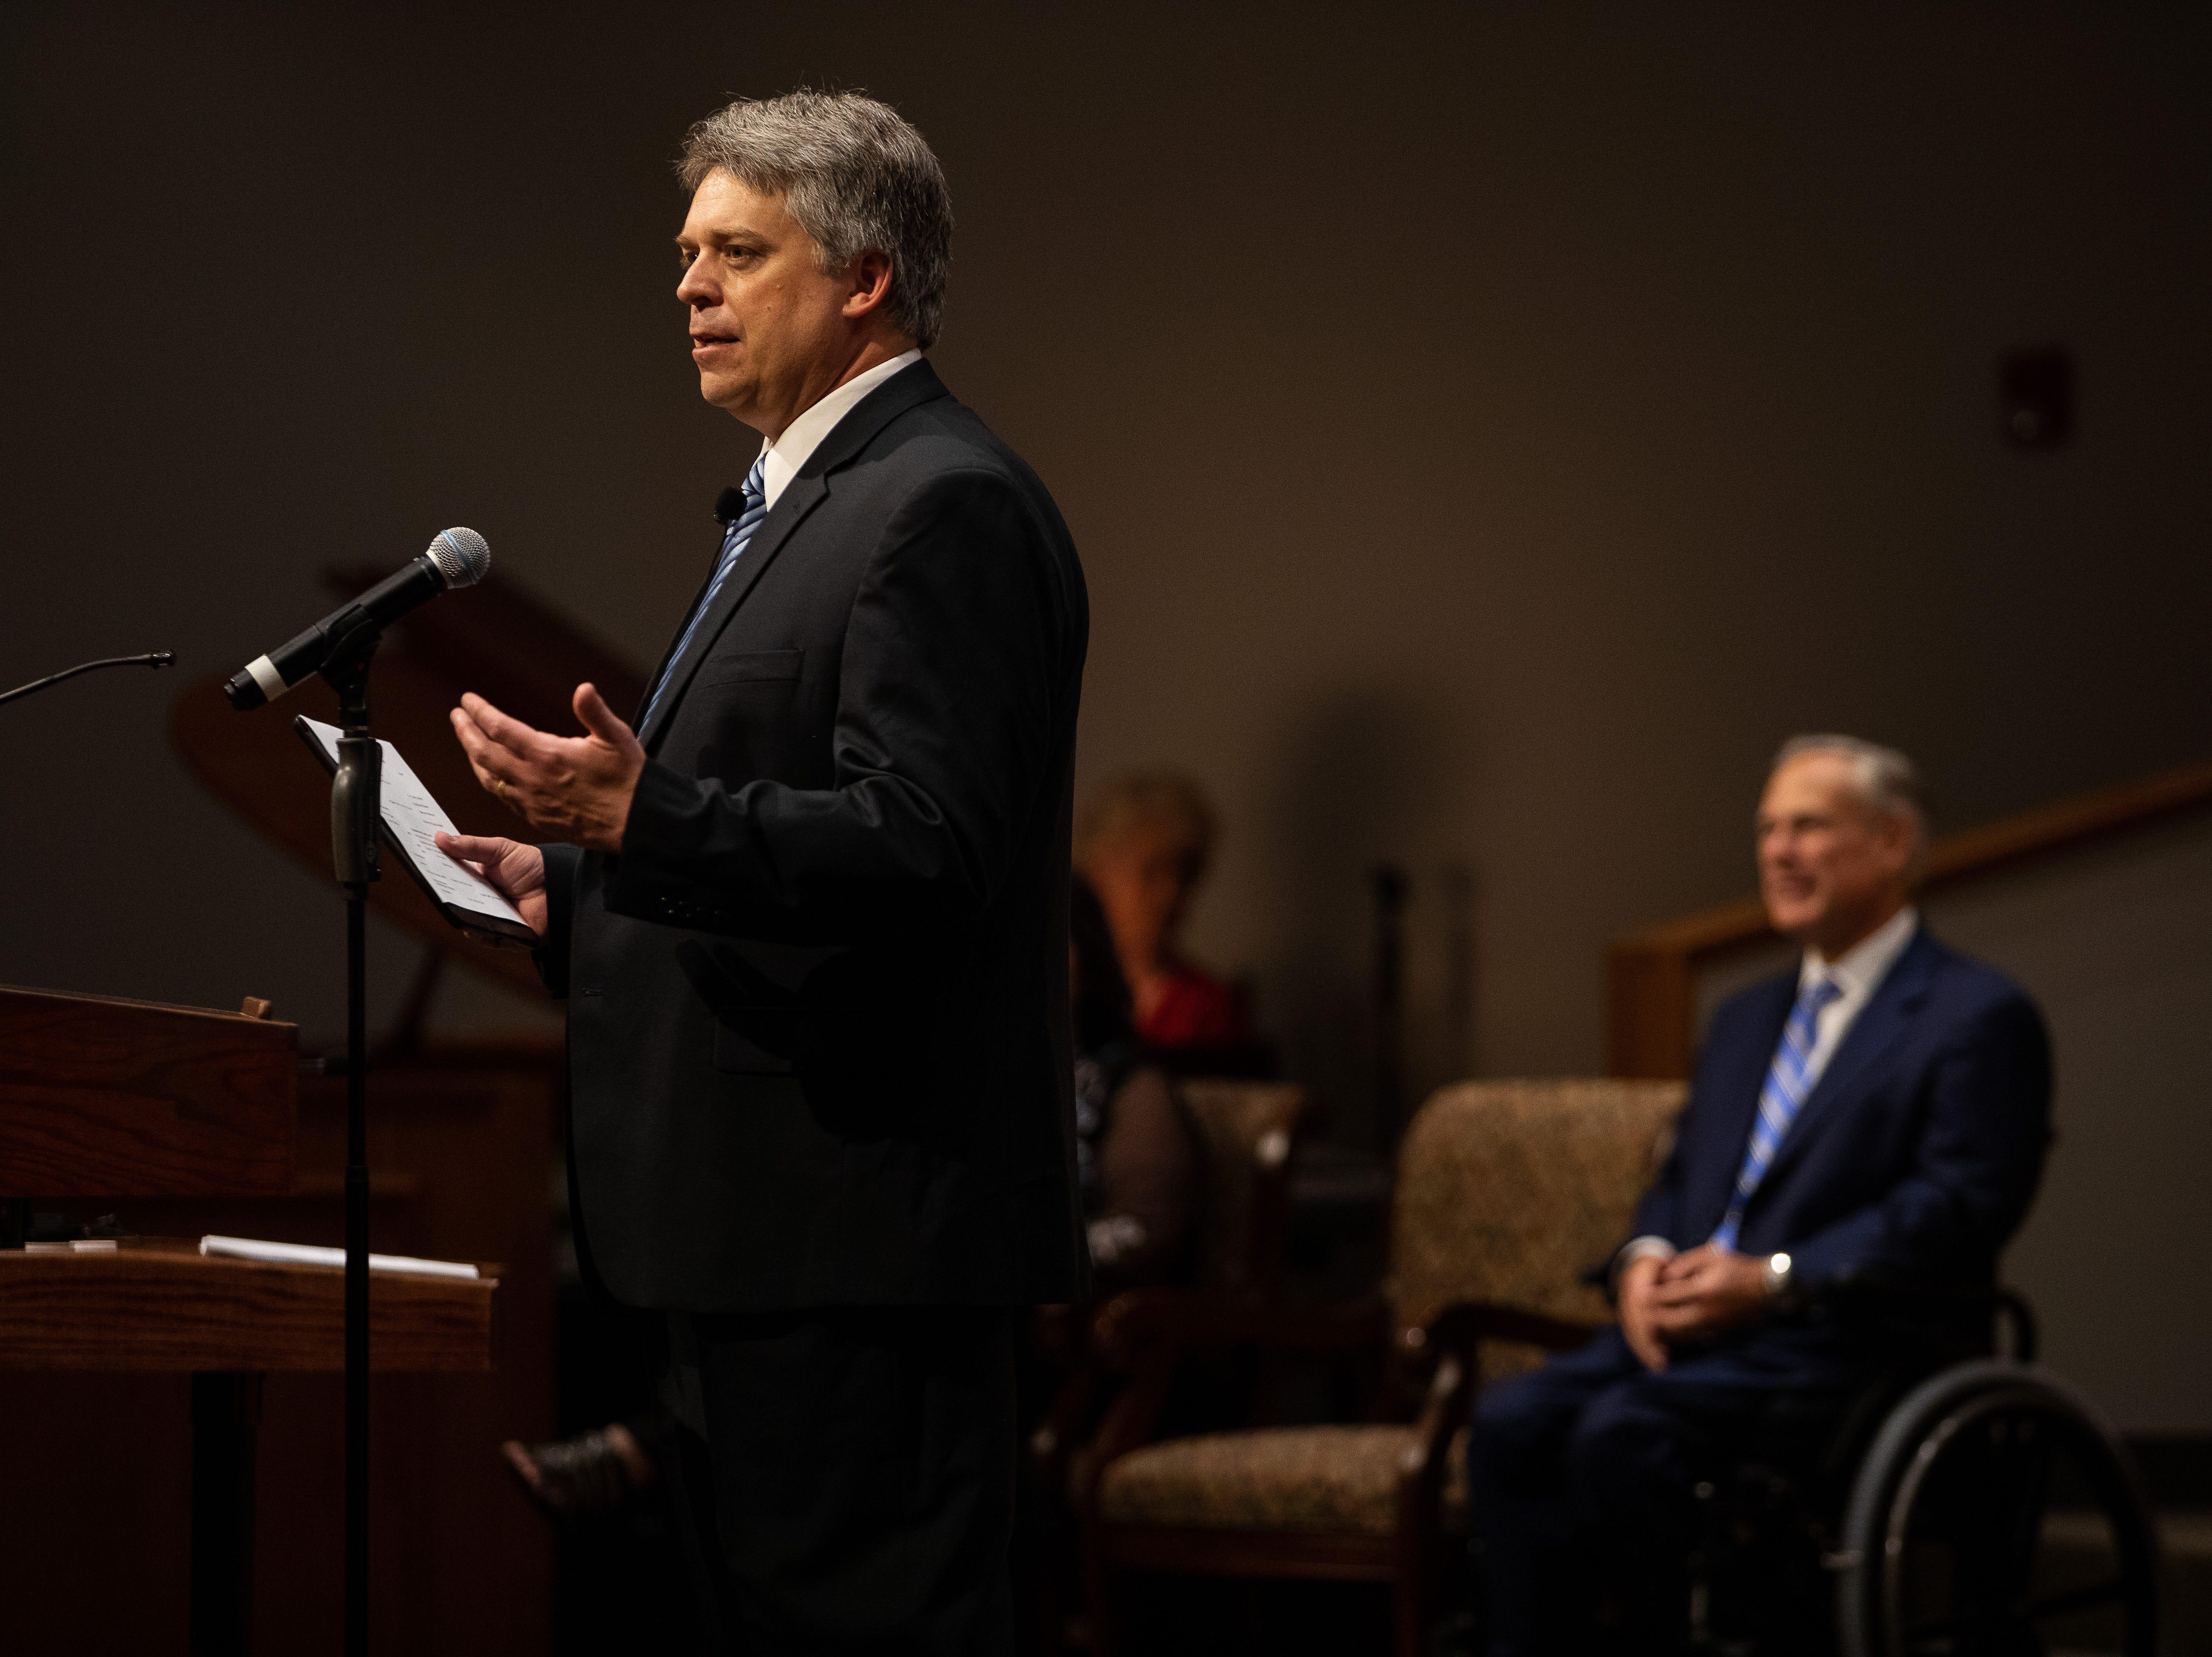 Senior Pastor Scott Jones speaks at the First Baptist Church of Rockport during its Hurricane Harvey anniversary service attended by Gov. Greg Abbott on Sunday, Aug. 26, 2018.